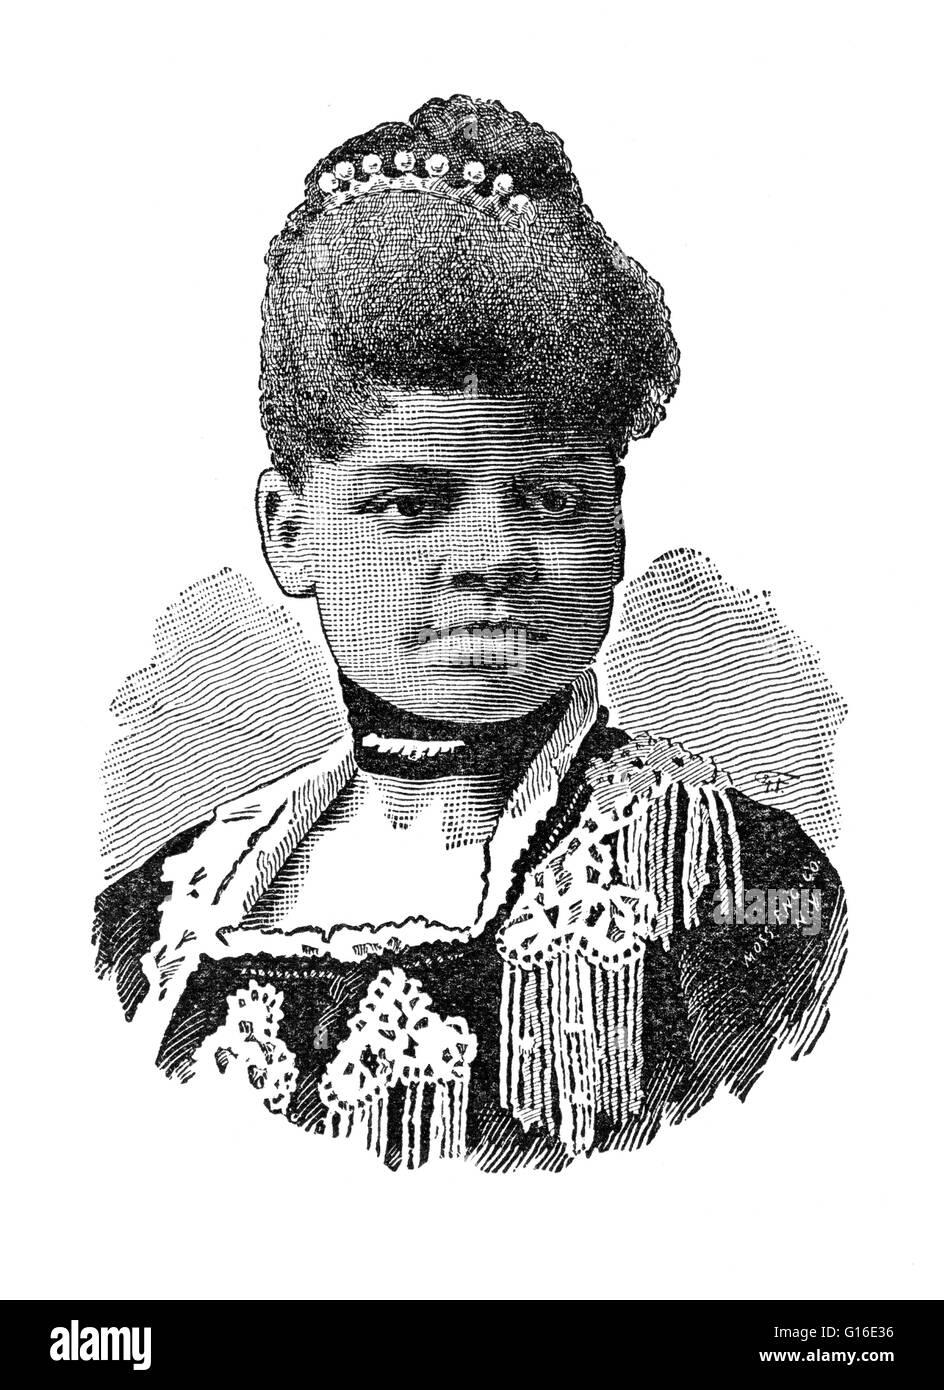 Ida B. Wells (July 16, 1862 - March 25, 1931) was an African-American journalist, newspaper editor, suffragist, - Stock Image